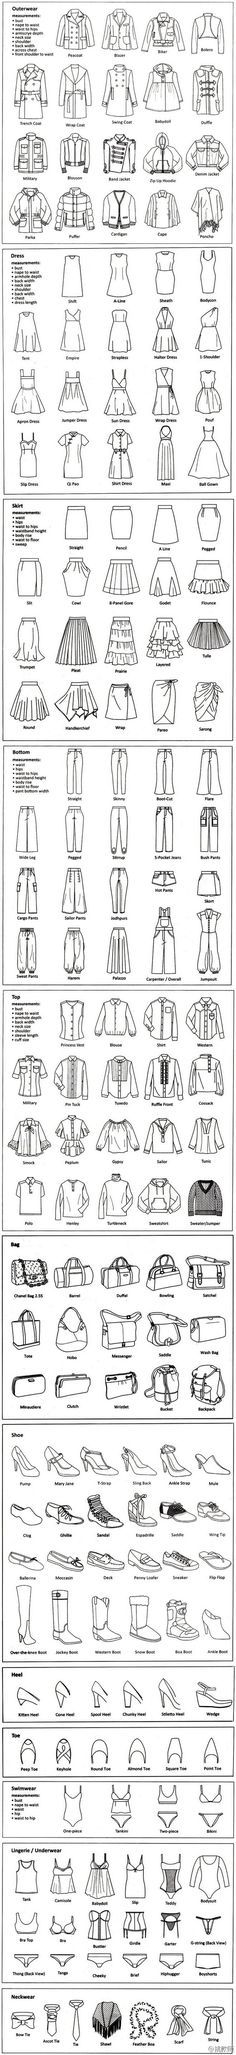 Garment Fashion Terminology | Fashion Design Sewing, Resources, Techniques, and Tutorials | Ideas for the Aspiring Fashion Designer